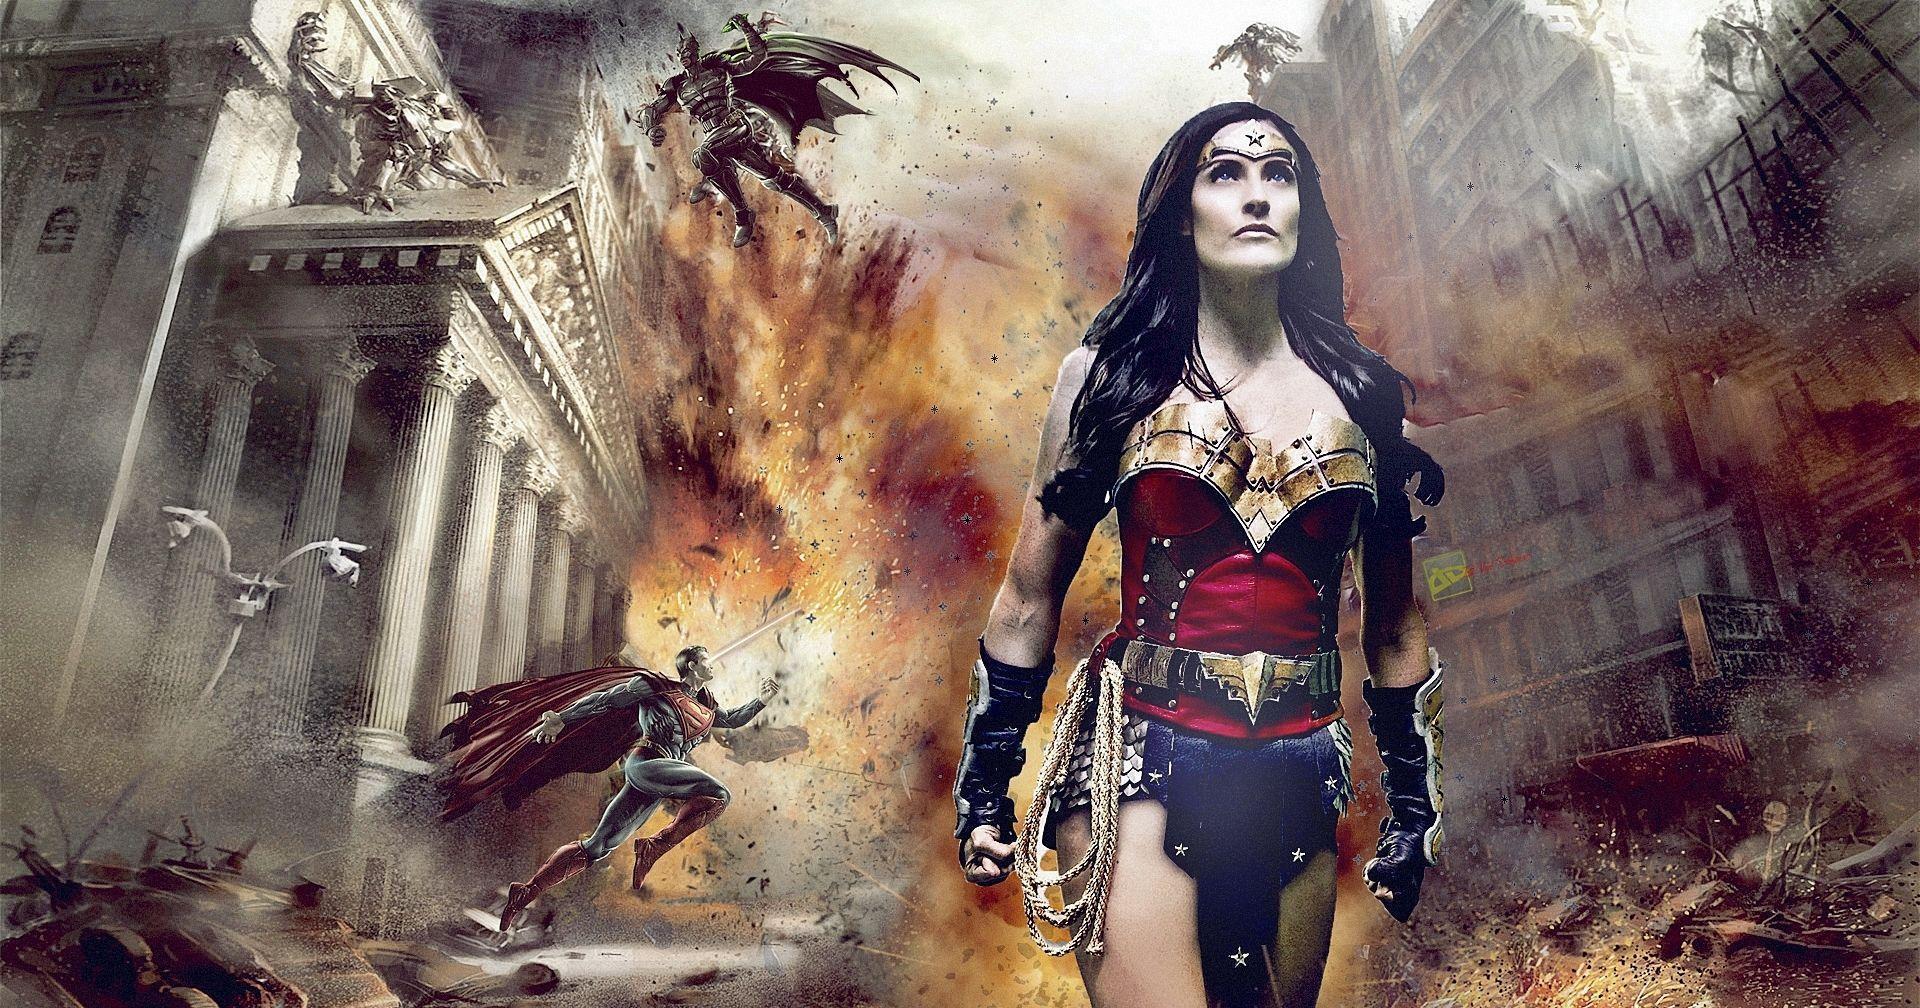 Wonder Woman HD Wallpapers For Your Desktop